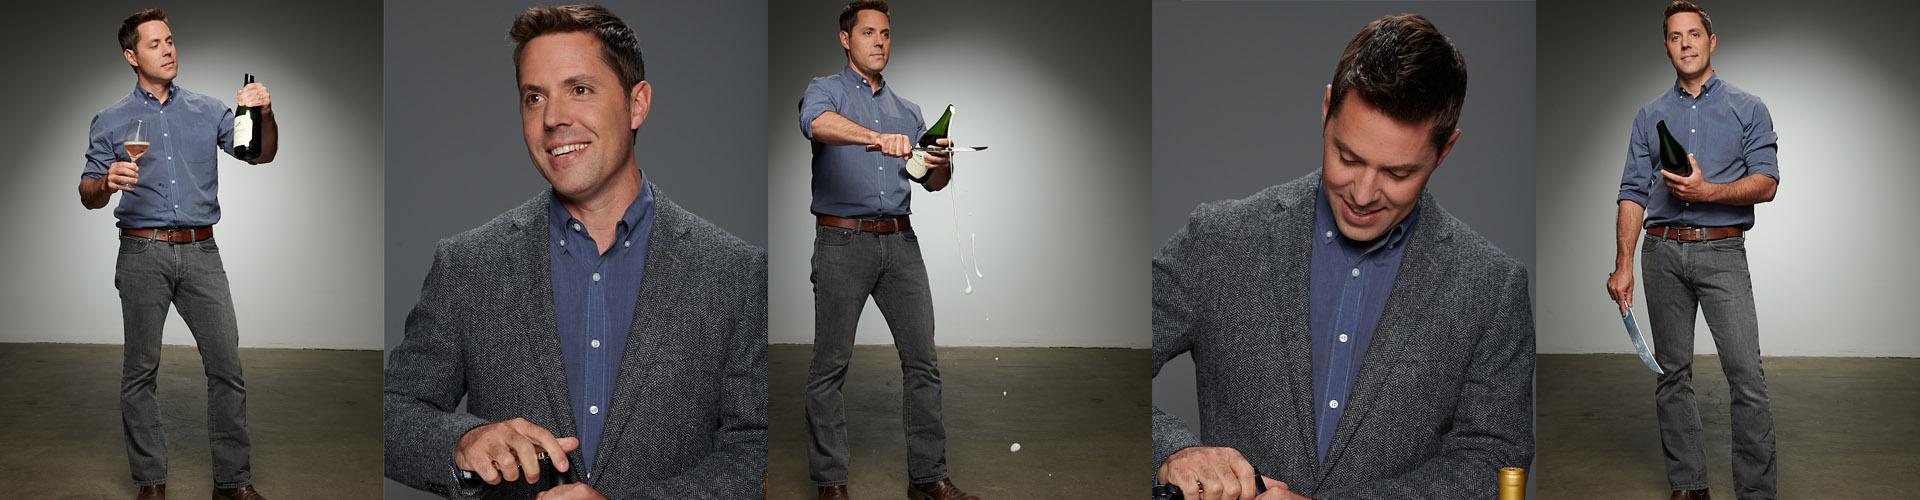 40 Under 40 Tastemaker 2018  Neil Bernardi, 37, St. Helena, CA Vice President of Winemaking, Duckhorn Wine Company; General Manager, Kosta Browne